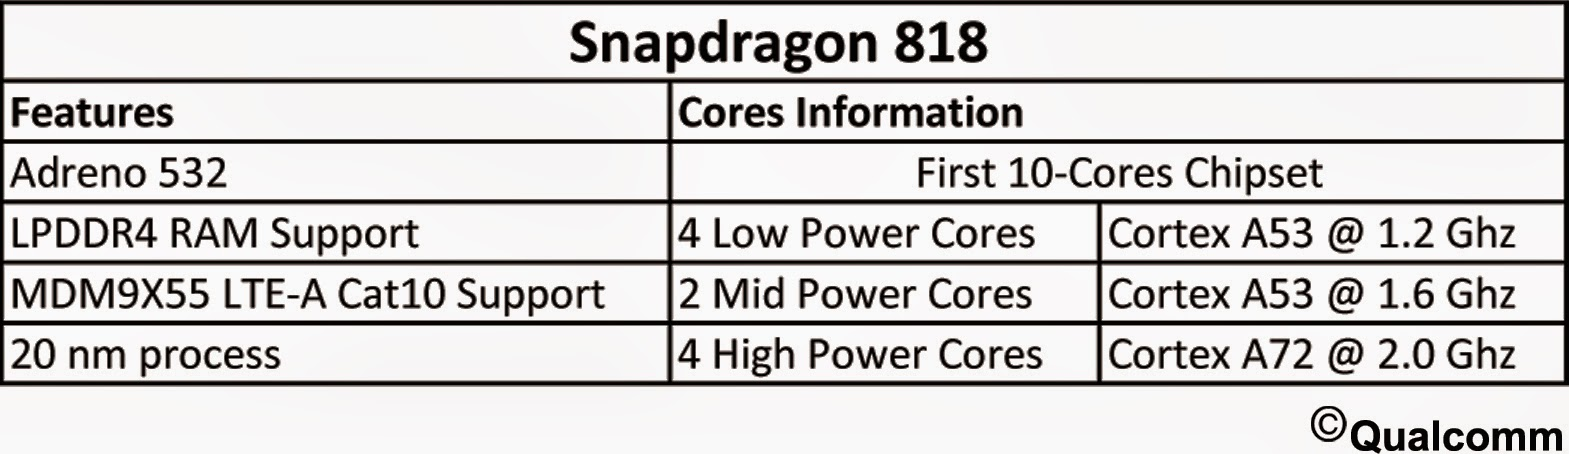 Sd818pdfcrp Qualcomm Snapdragon 818 !!?? image